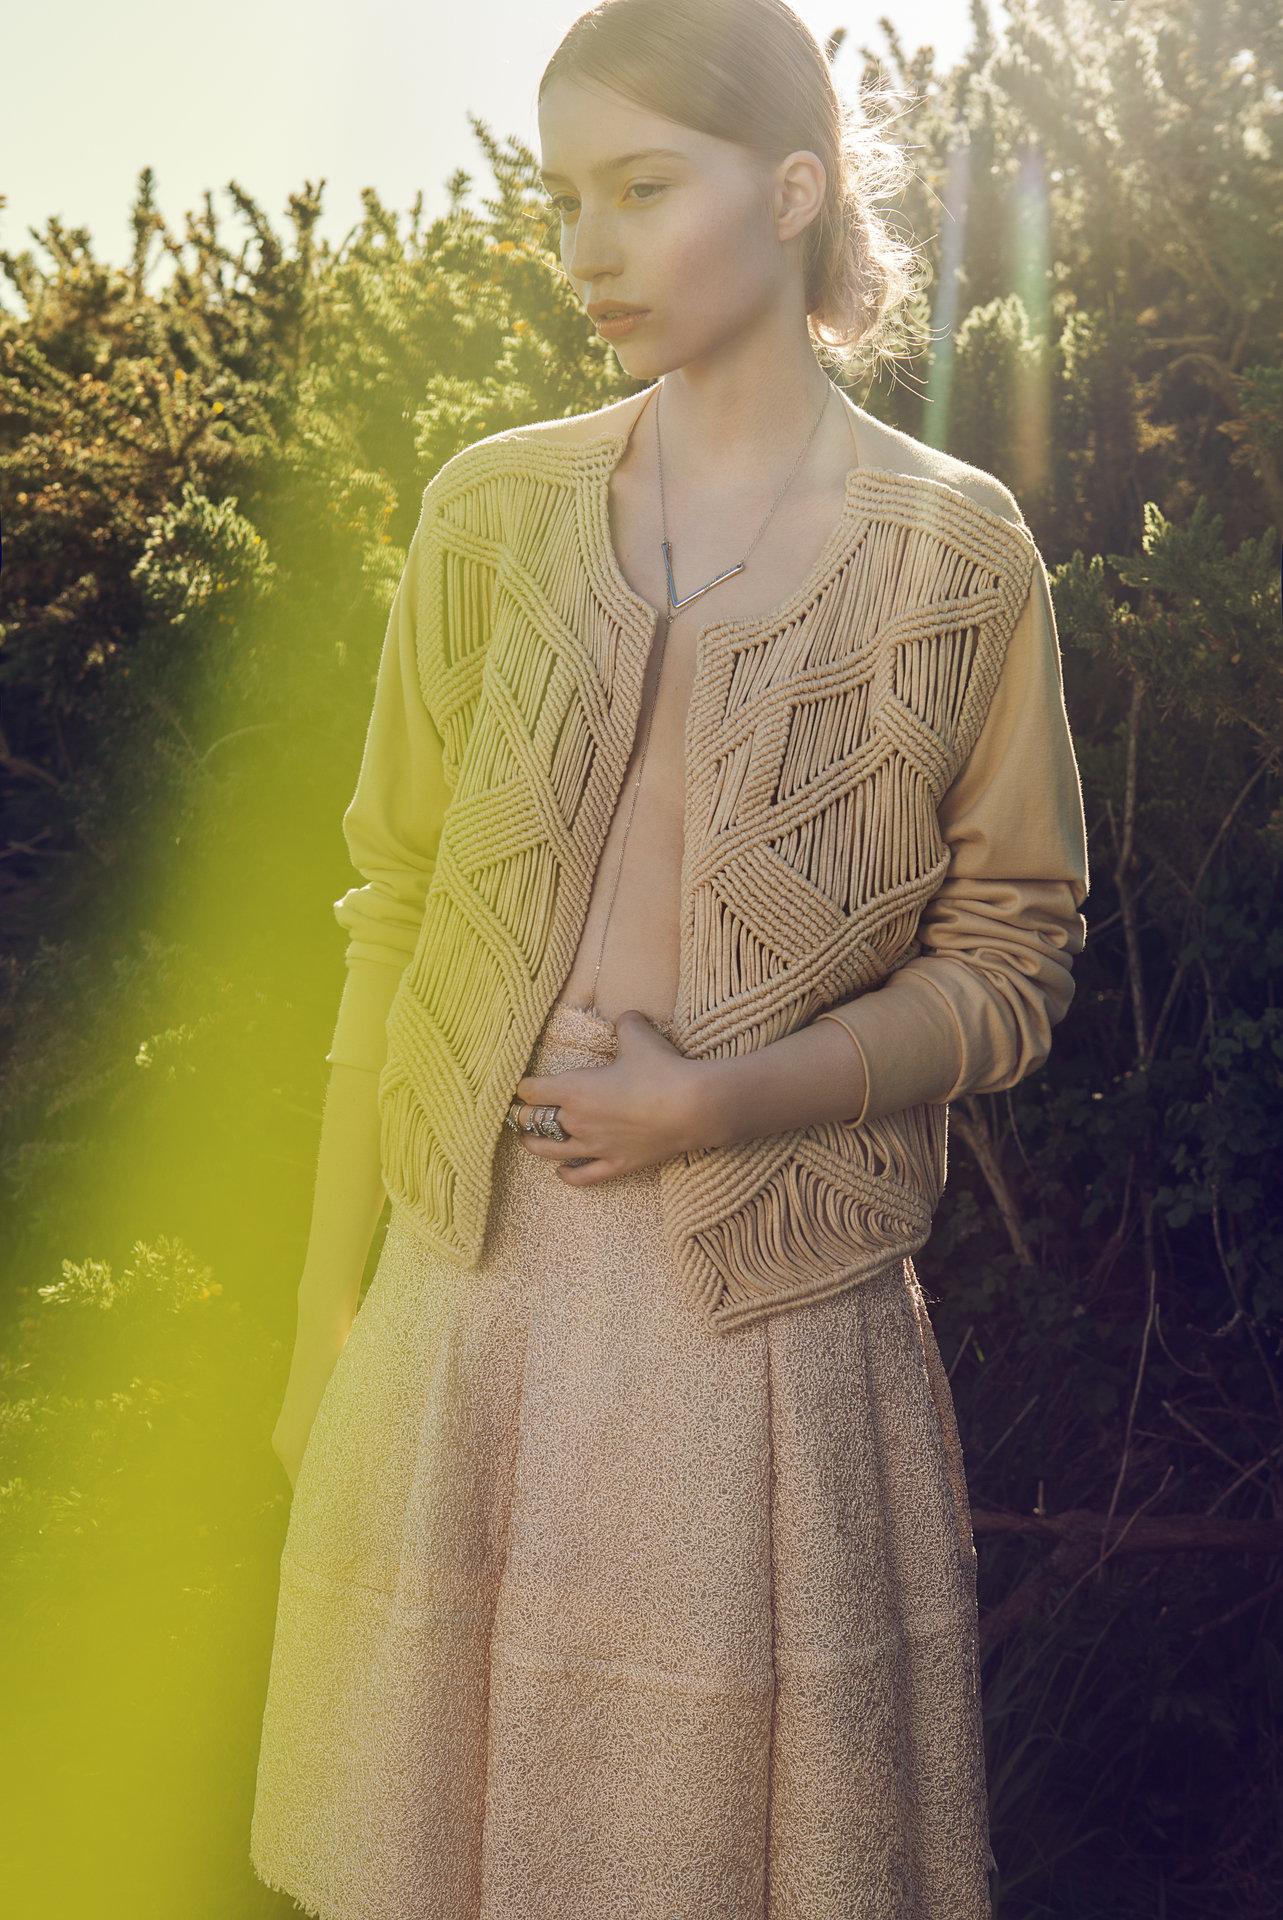 JUTE FASHION MAGAZINE  Hair & Makeup & Manicure: Melanie Volkart Photographer: Ellin Anderegg  Stylist: Sabine Lauber  Model: Romaine @ Mademoiselle Agency